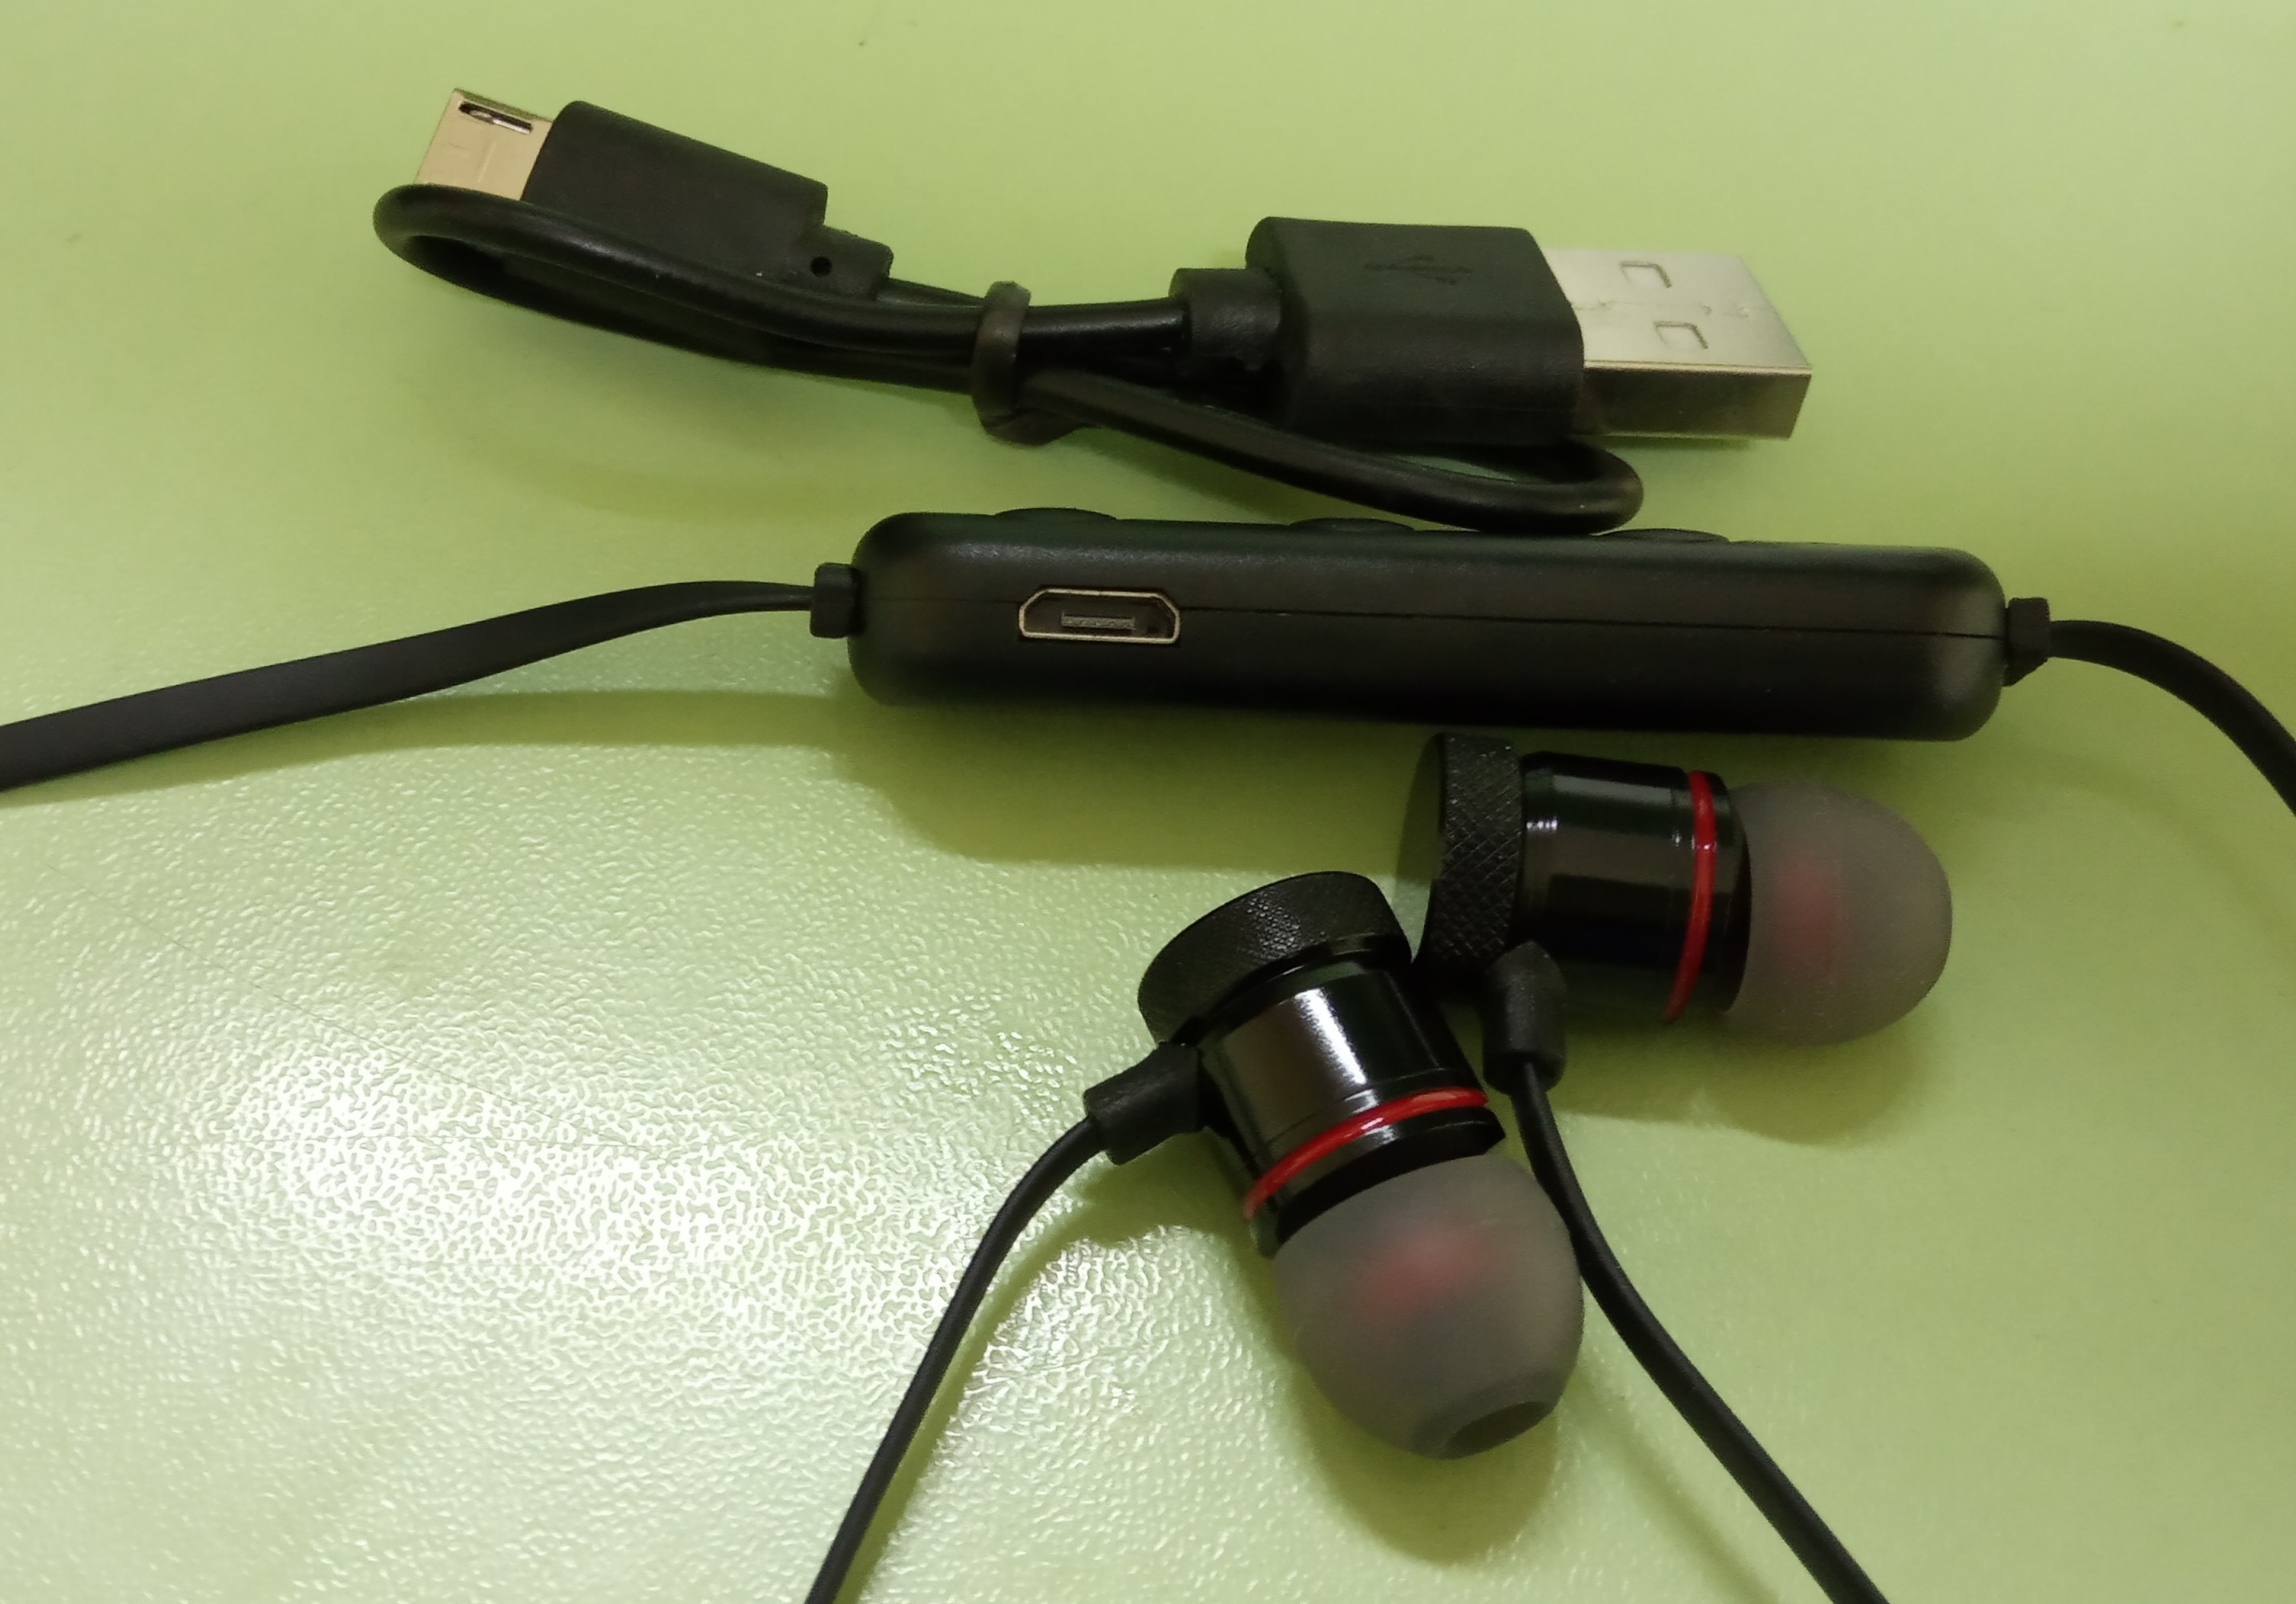 kebidu earphones and headphone Wireless Sweat Proof Magnetic Earpiece Stereo Bluetooth Headphone Headset For Mobile Phone|earphones and headphone|bluetooth headphones headsetheadphones headset - AliExpress